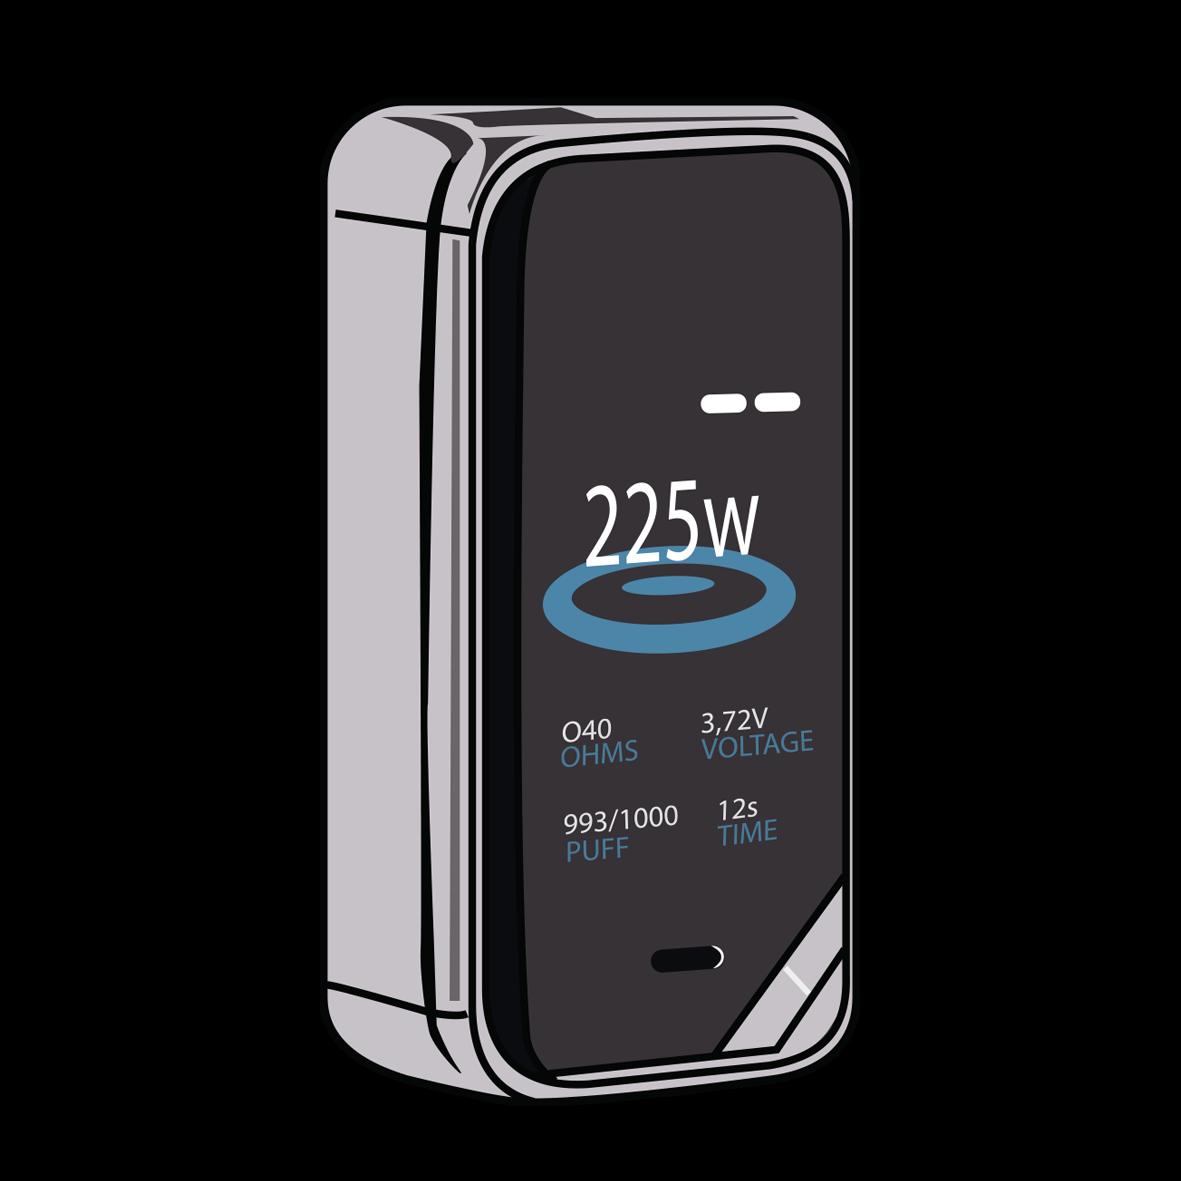 Mod 2 battery